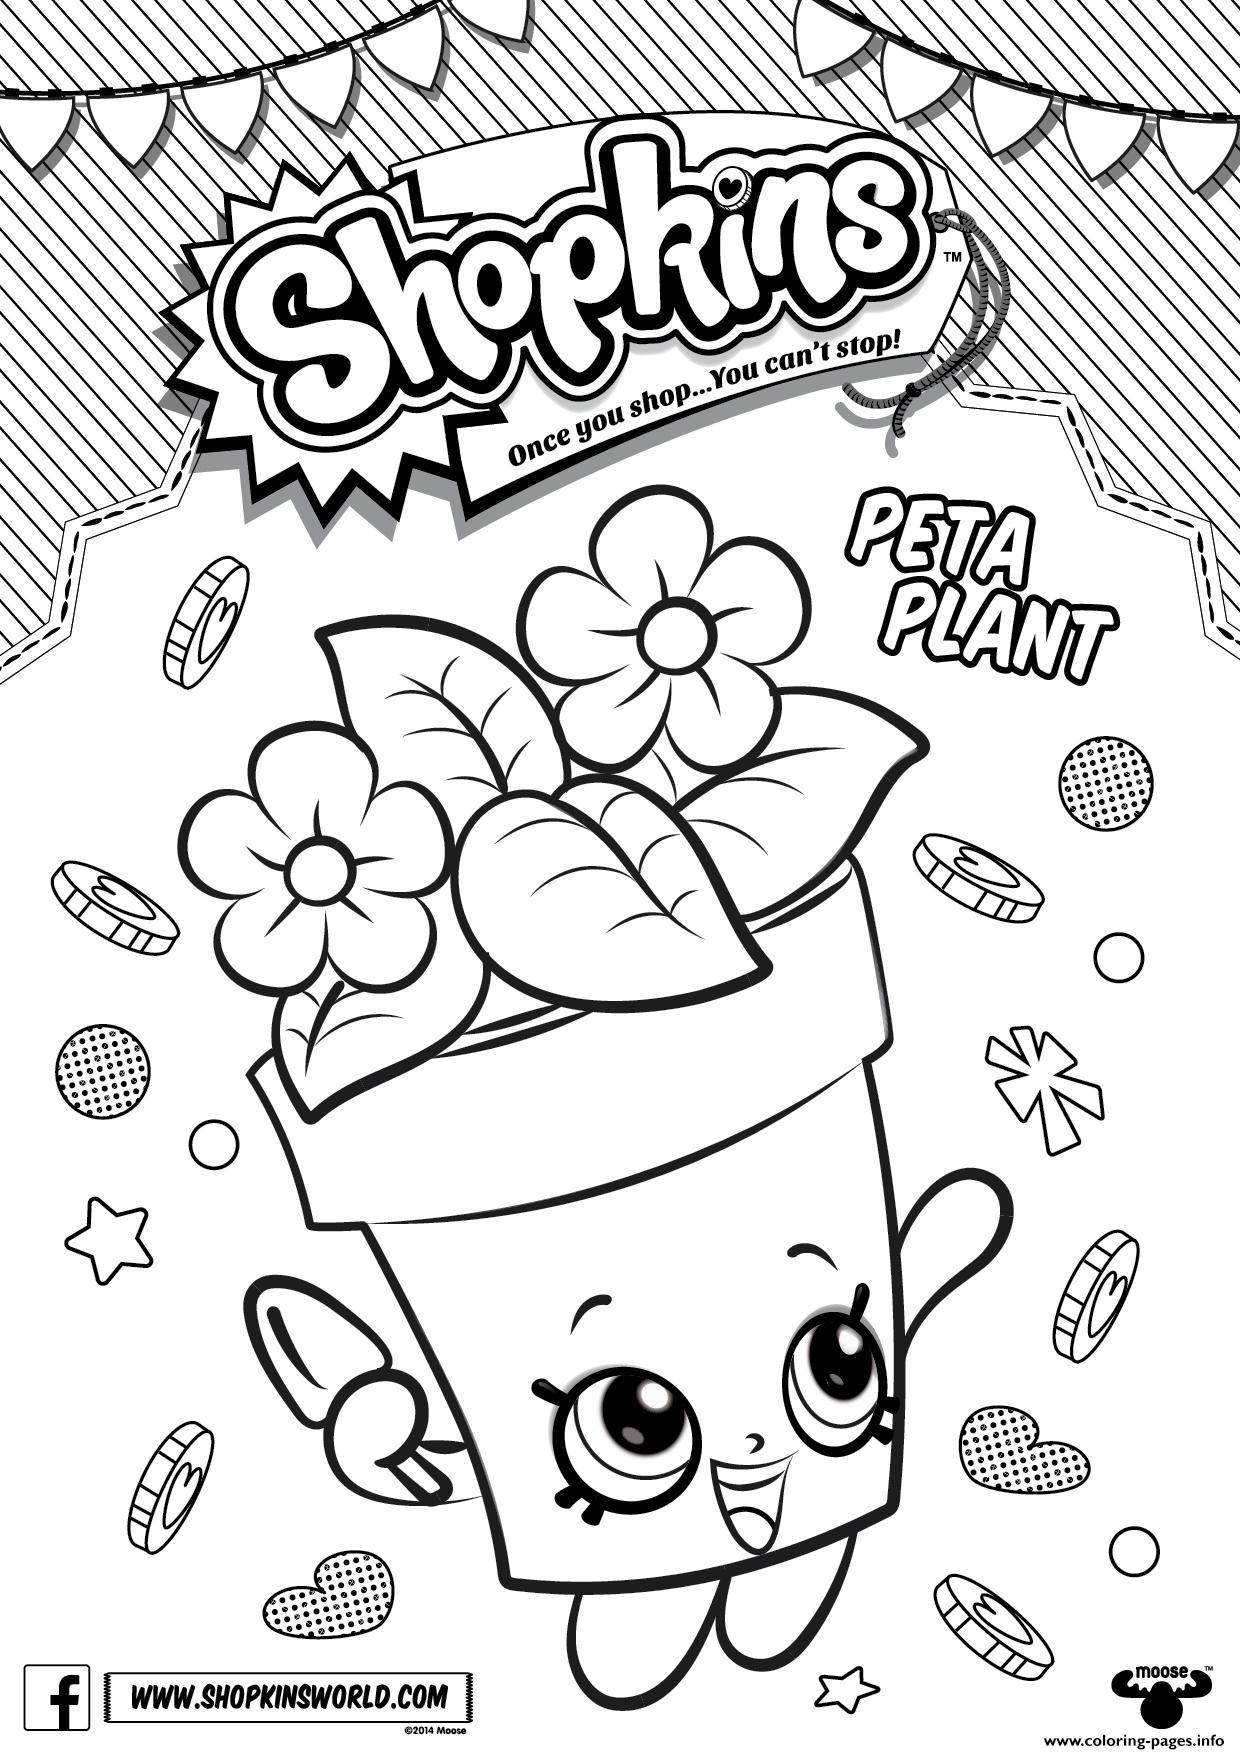 Shopkins Peta Plant Coloring Pages Printable